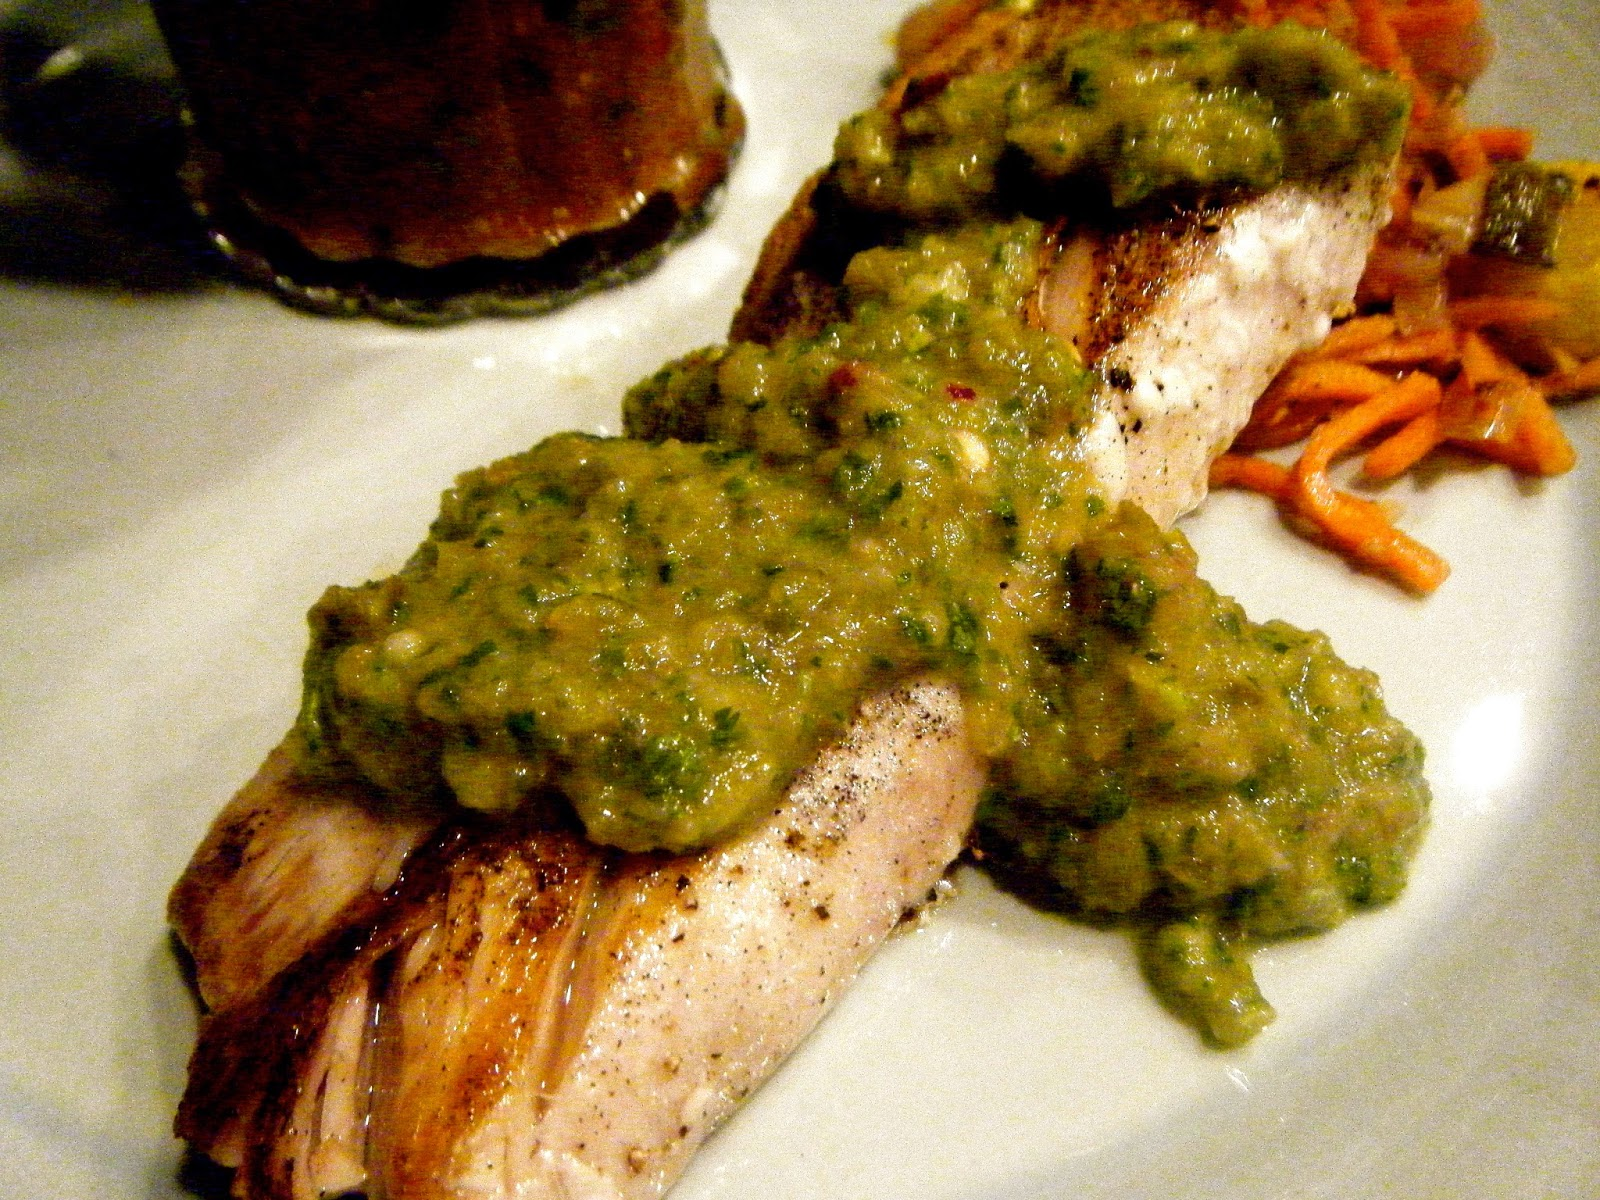 Katie-Kate's Kitchen: Tilapia with Salsa Verde